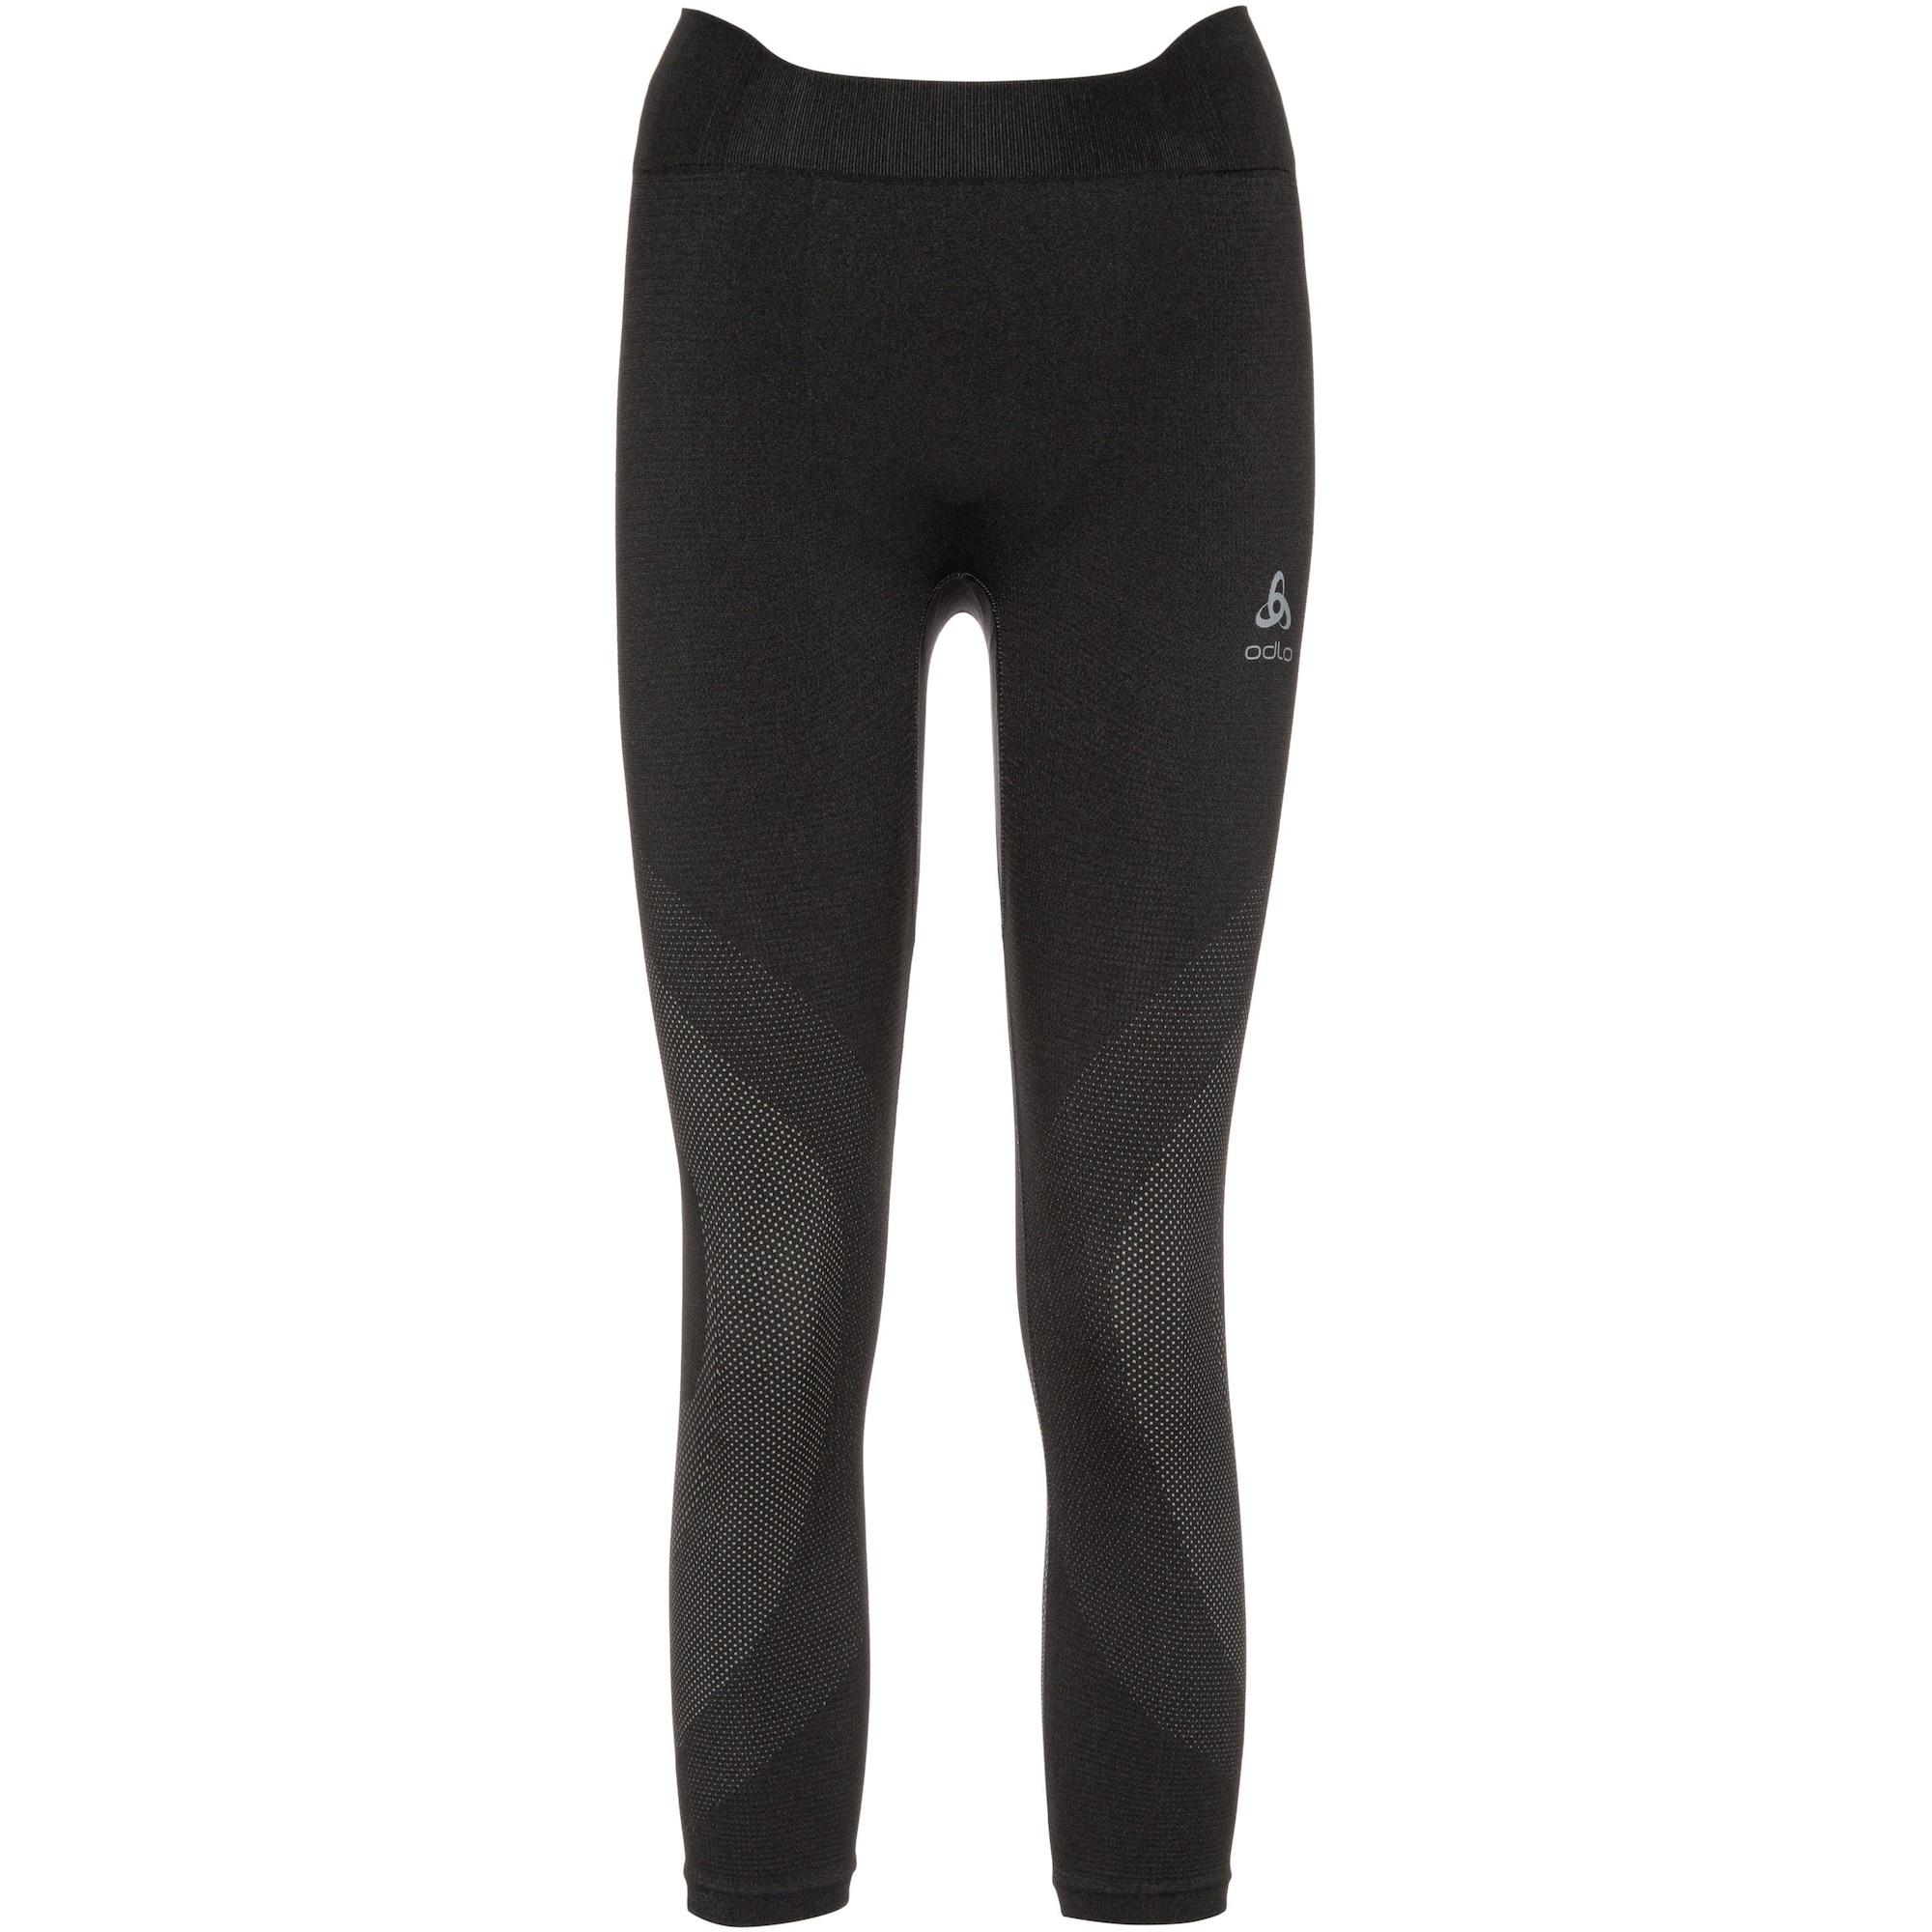 Funktionsunterhose | Sportbekleidung > Funktionswäsche | ODLO